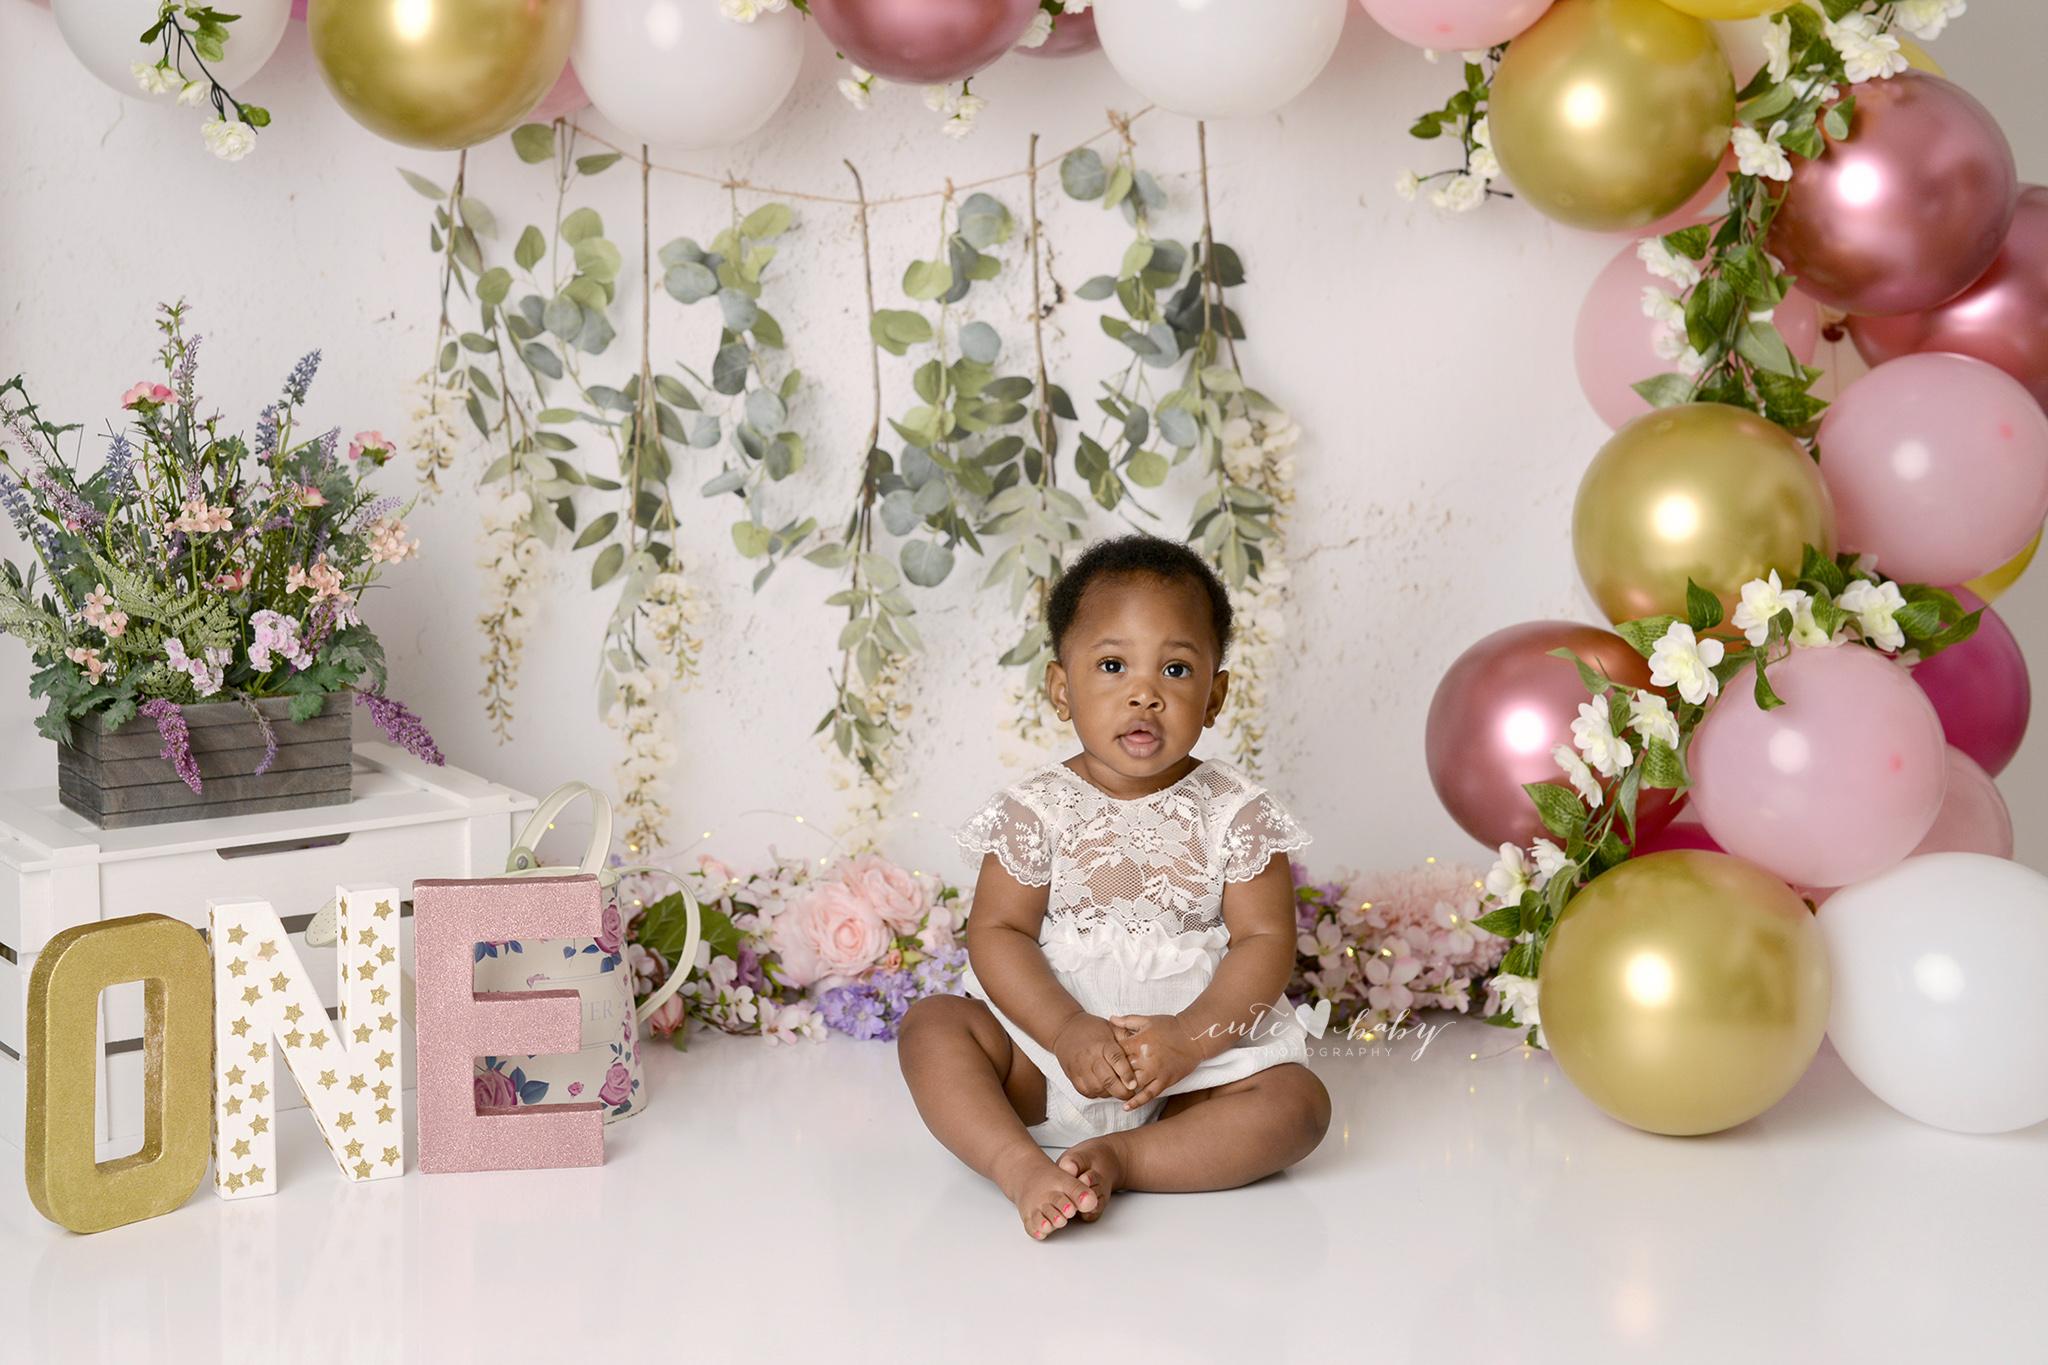 cake smash Manchester, Baby Photography Manchester, 1st Birthday photography, Cake Smash